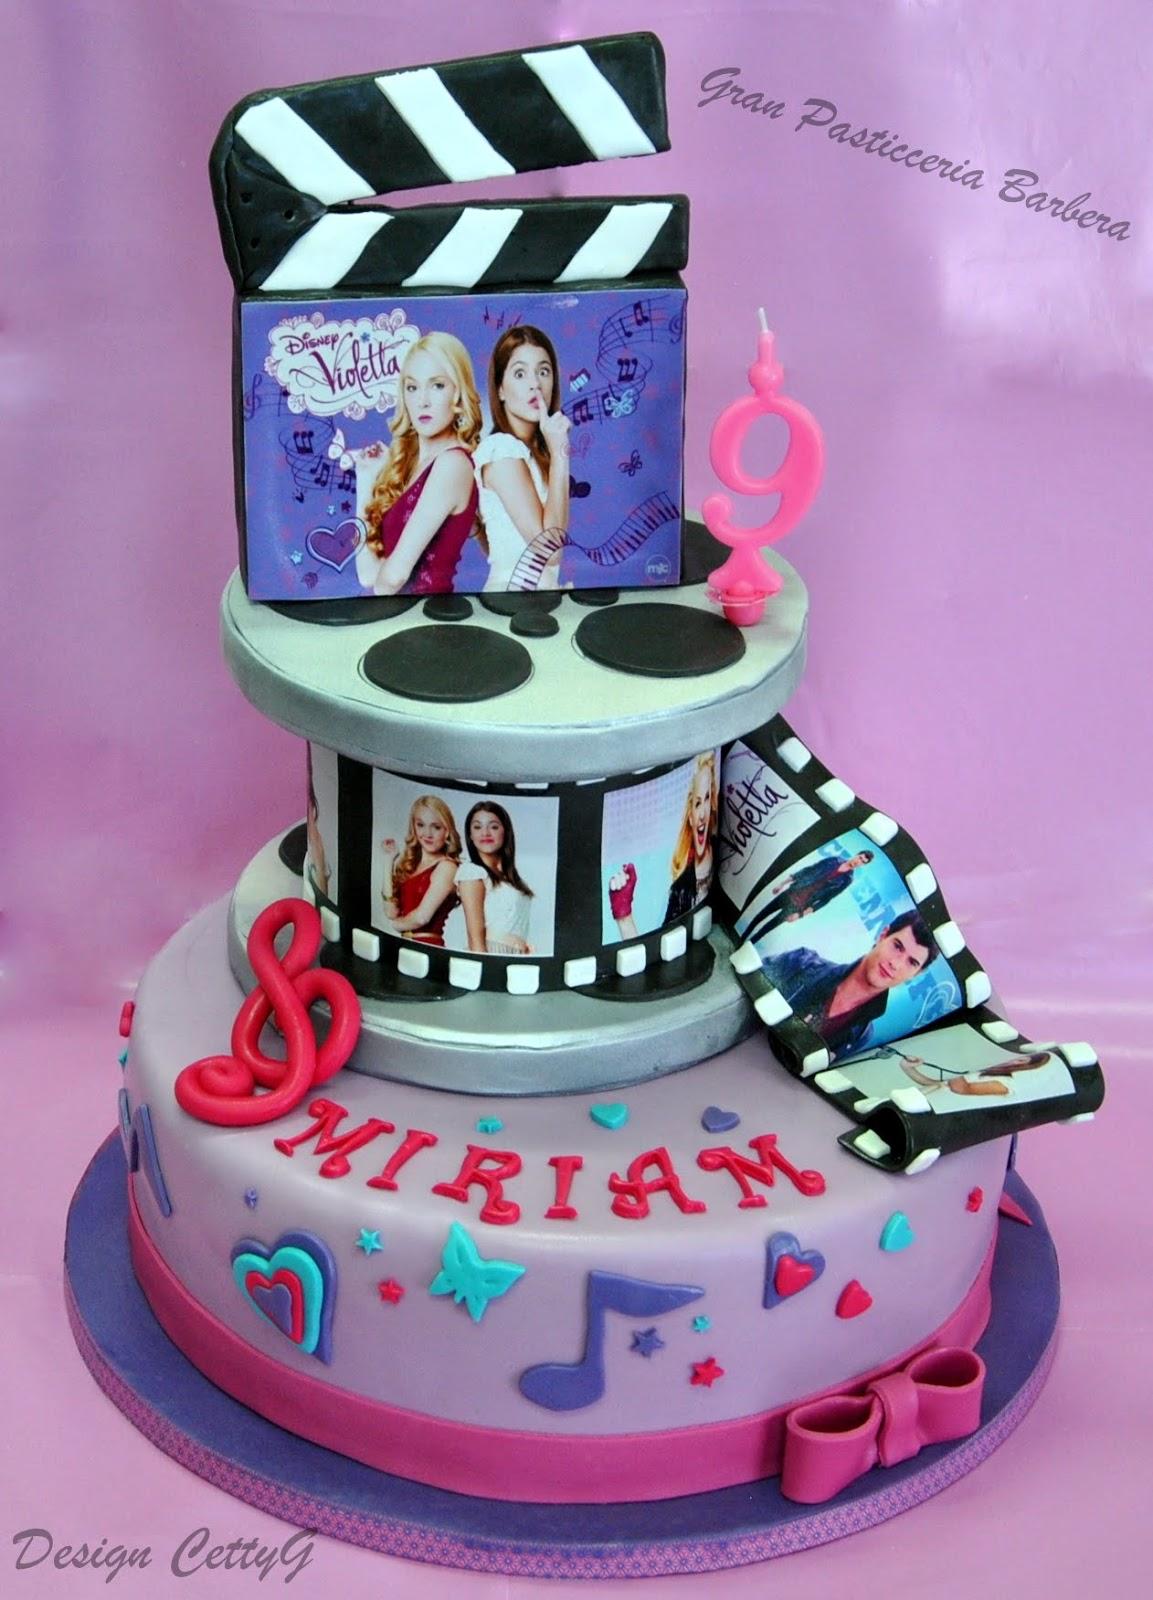 Cake Design Di Violetta : Le torte decorate di Cetty G: Violetta cake!